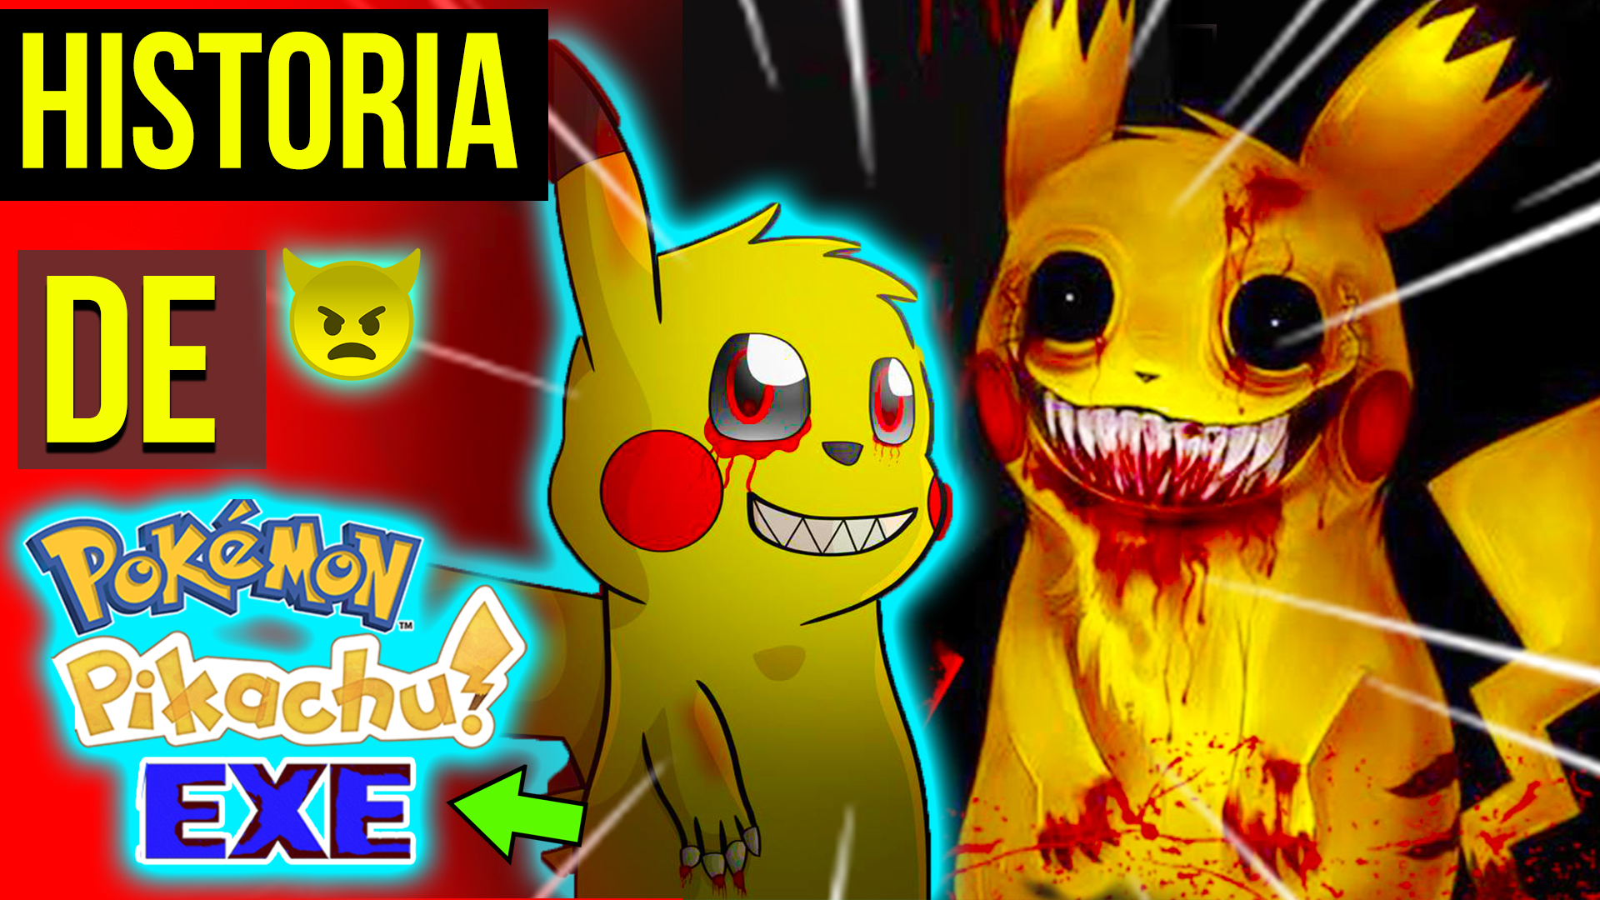 Pokémon Pikachu.exe